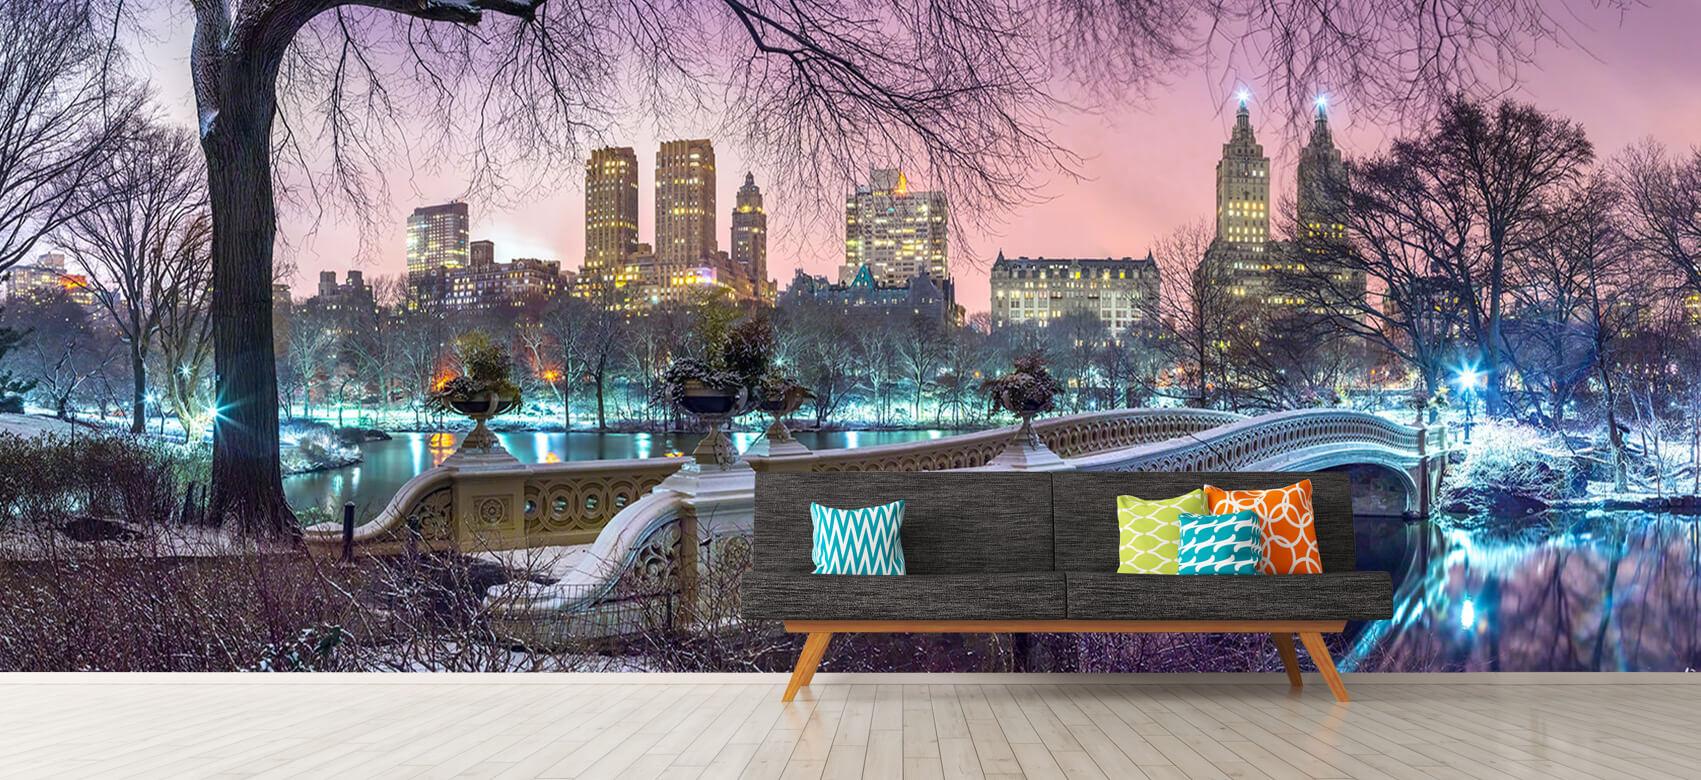 Colourful Central Park 7